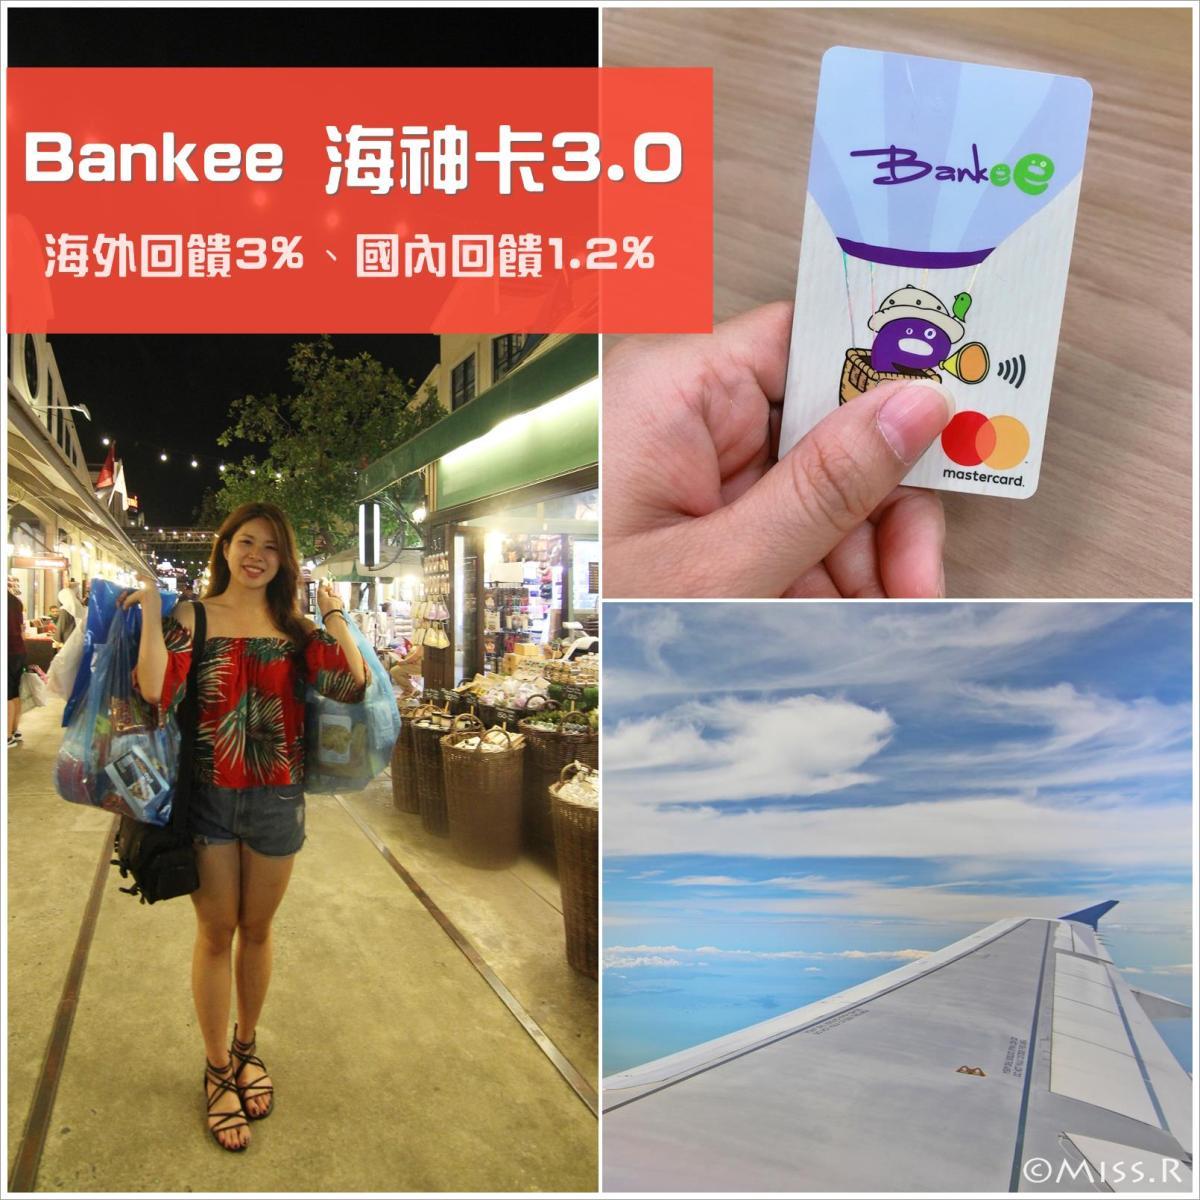 """Bankee,bankee海神卡3.0,遠東商銀,遠東商銀信用卡,bankeemgm,海外刷卡回饋,信用卡回饋比較,bankee推薦網址,信用卡點數"""